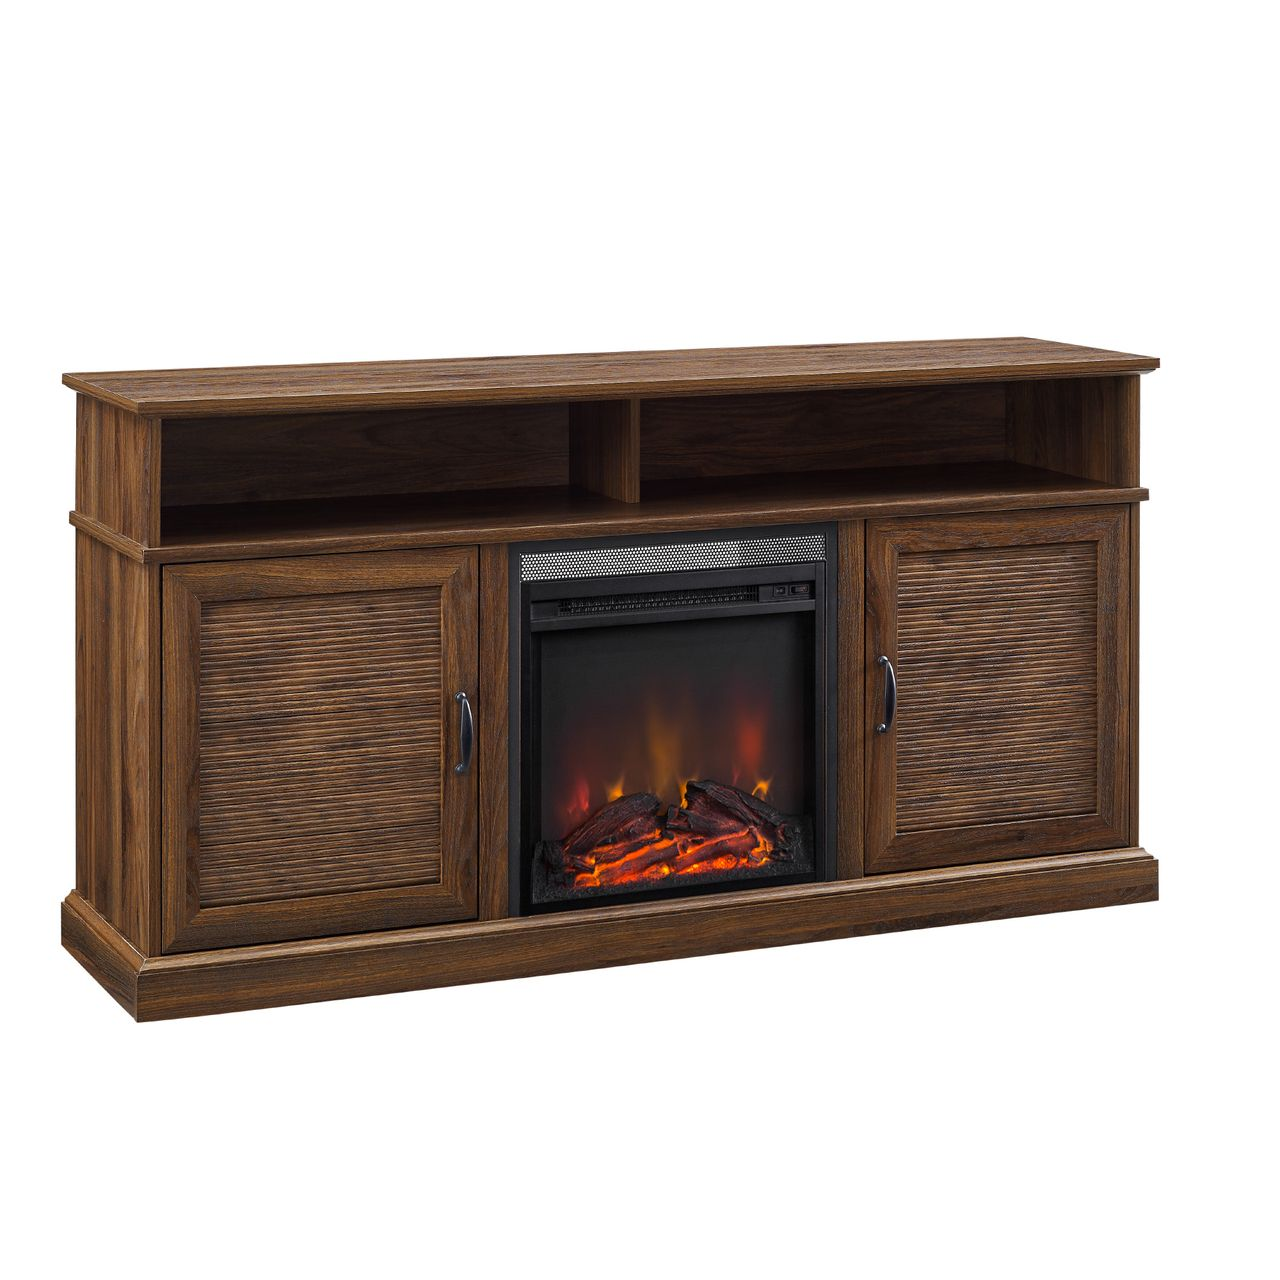 "Walker Edison Dayton 60"" Highboy Fireplace TV Stand - Dark Walnut"